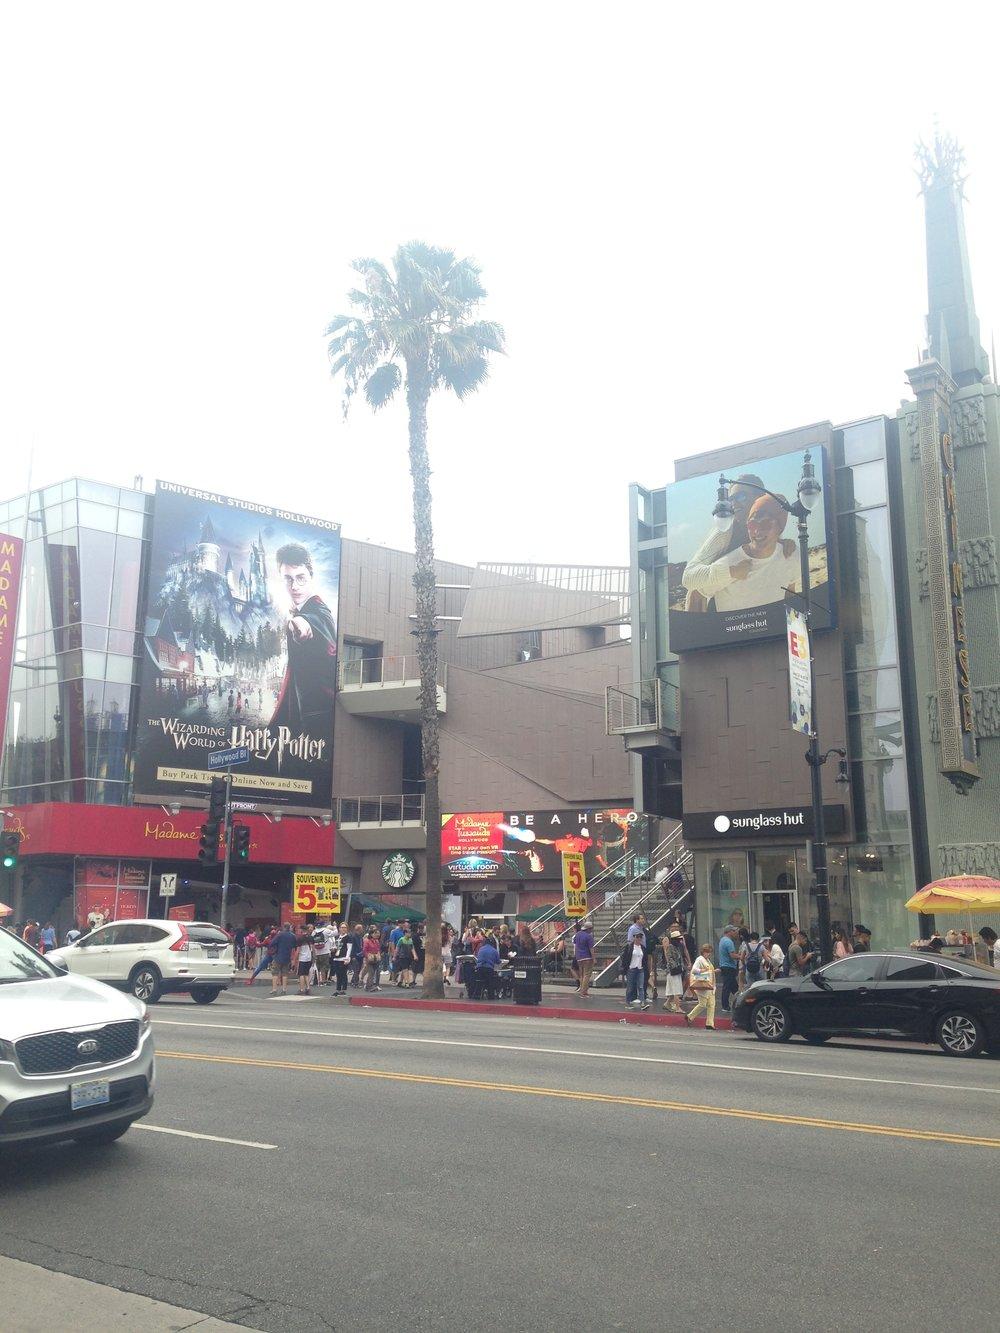 ^ Hollywood Blvd